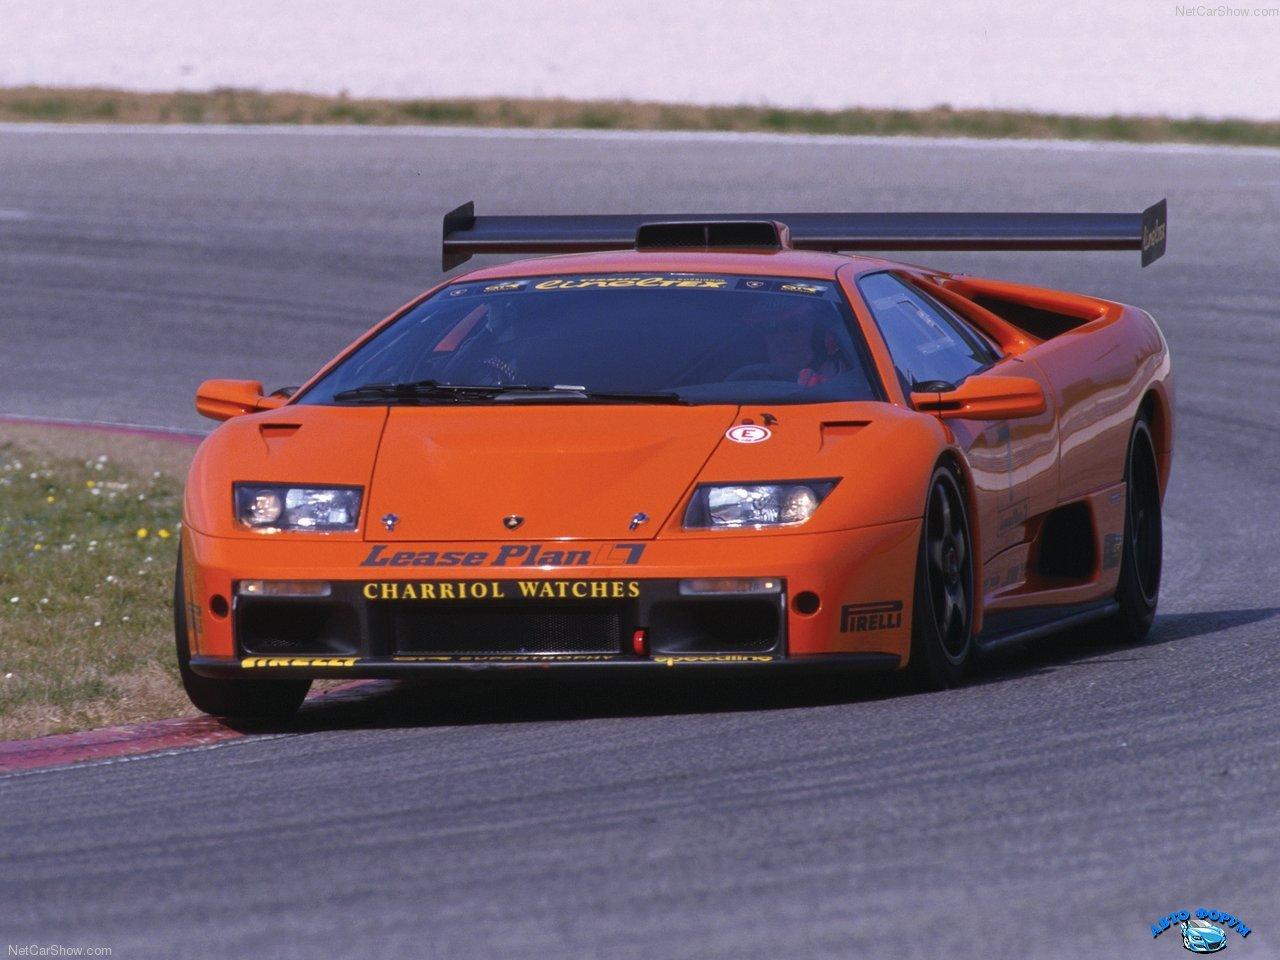 Lamborghini-Diablo_GTR_1999_1280x960_wallpaper_01.jpg